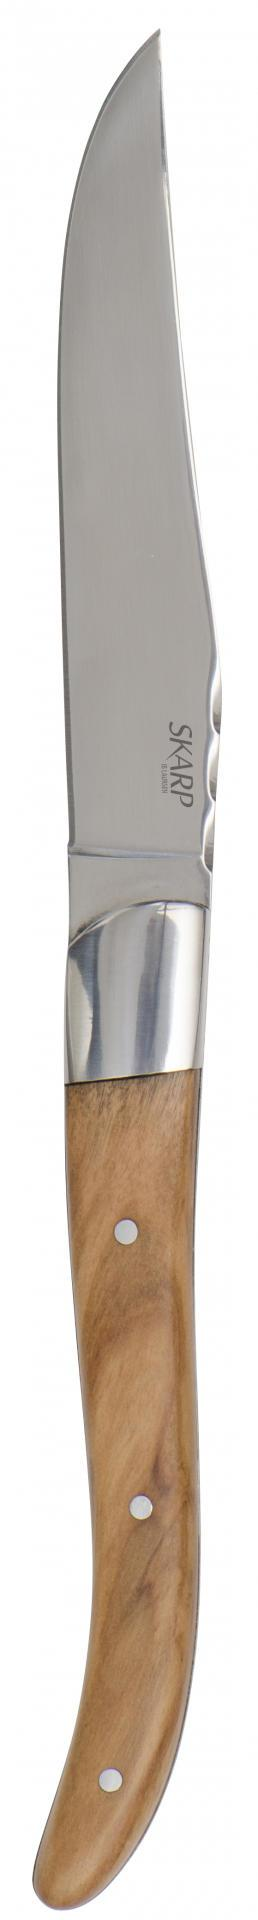 IB LAURSEN Steakový nůž SKARP